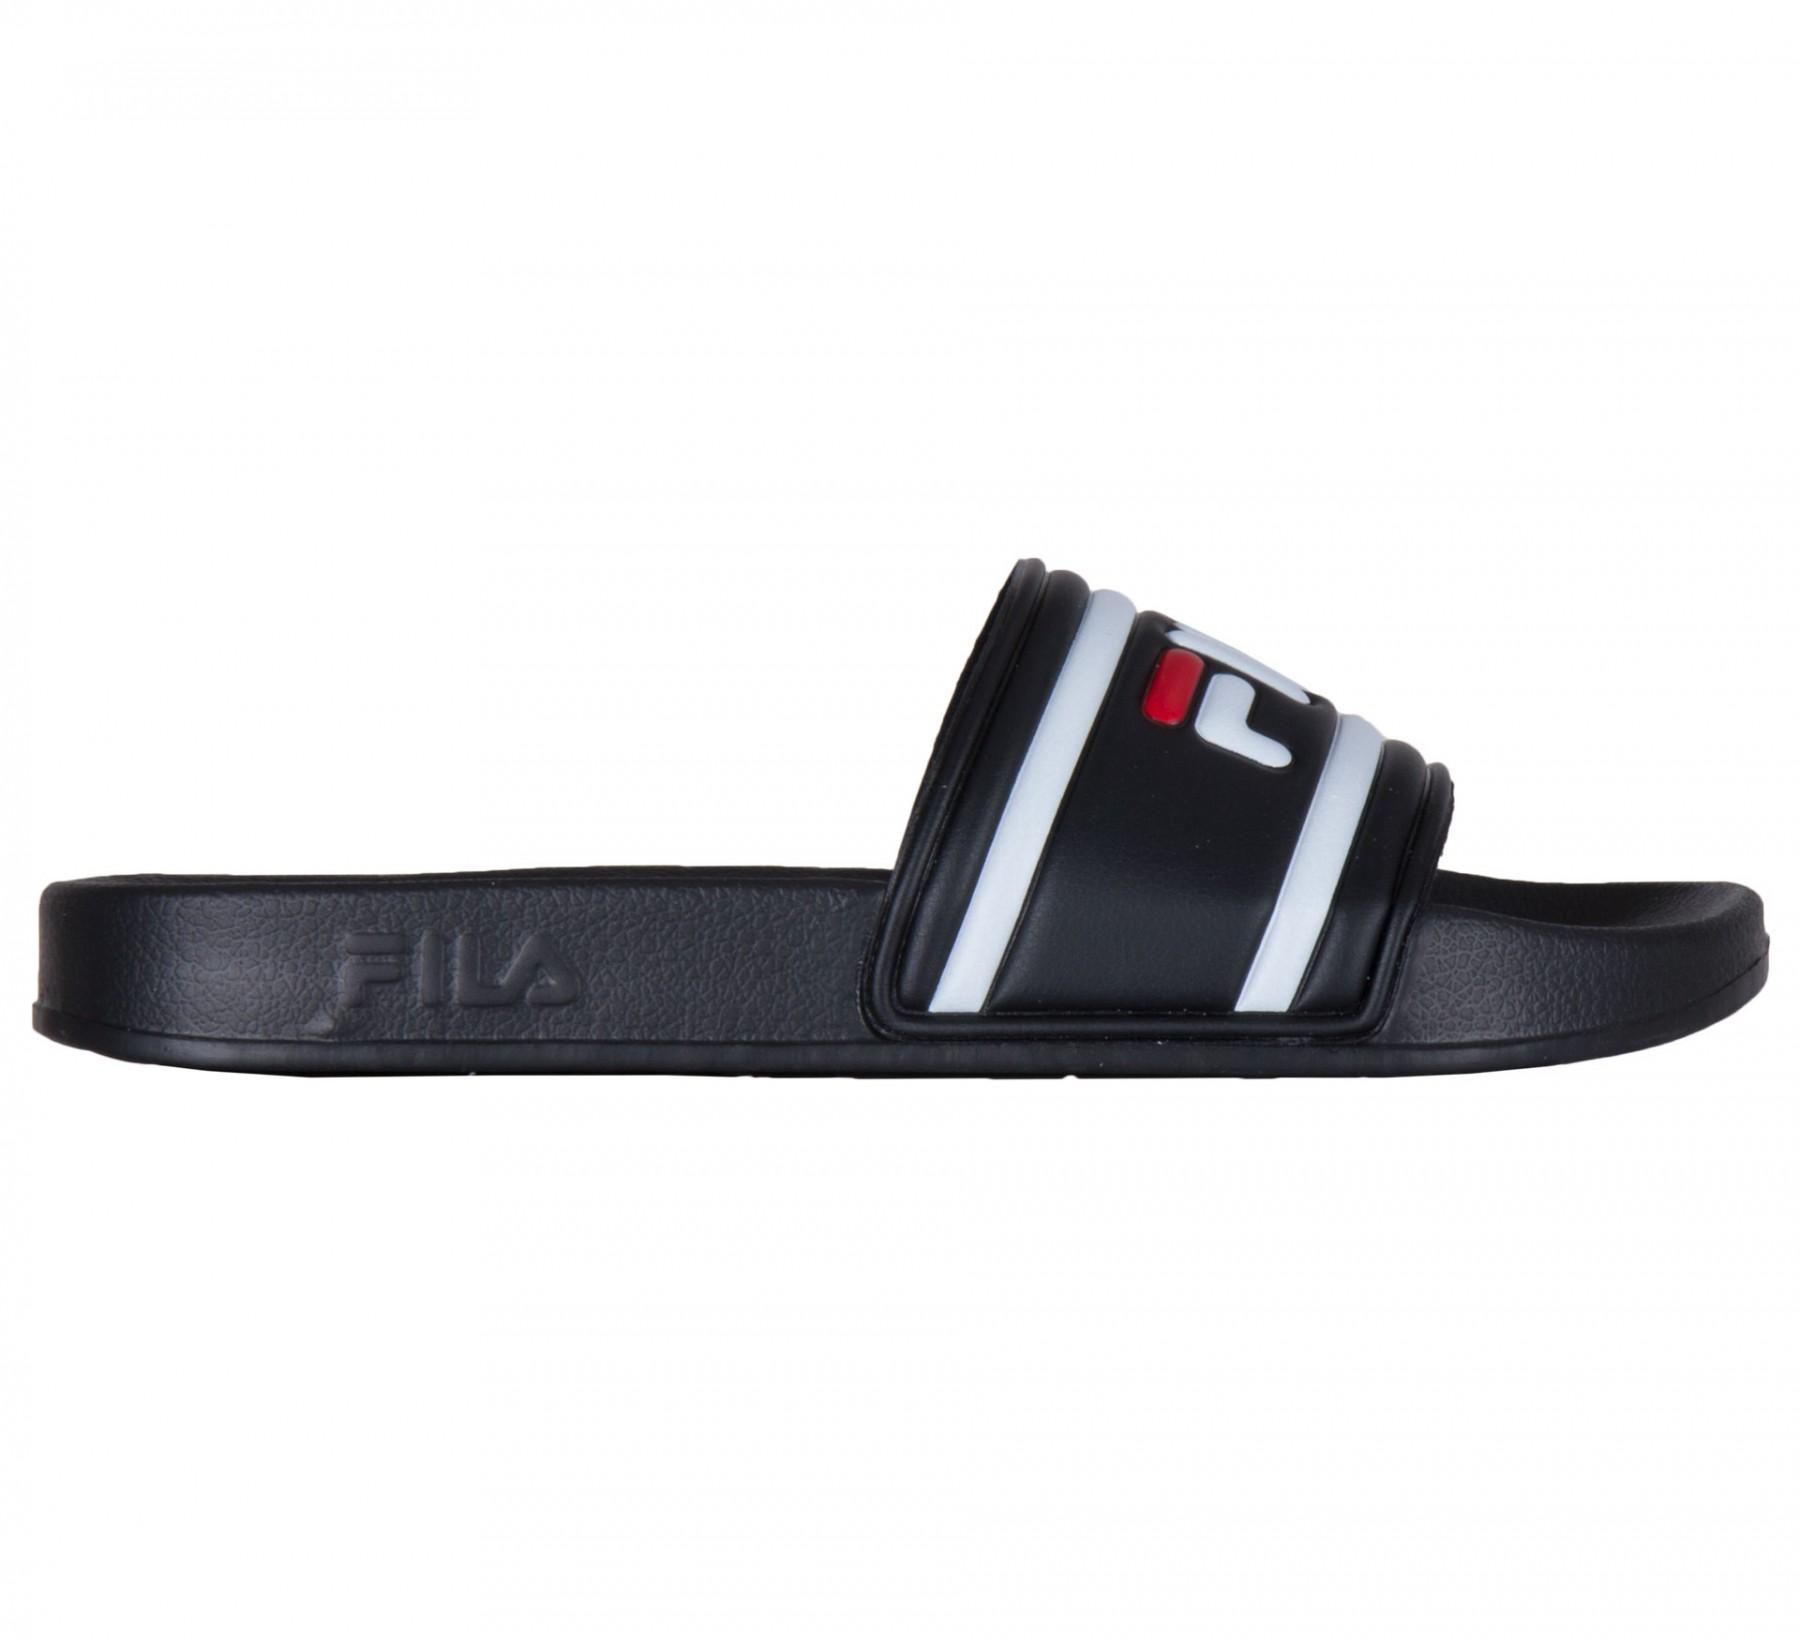 Fila Morro bay slipper badslippers